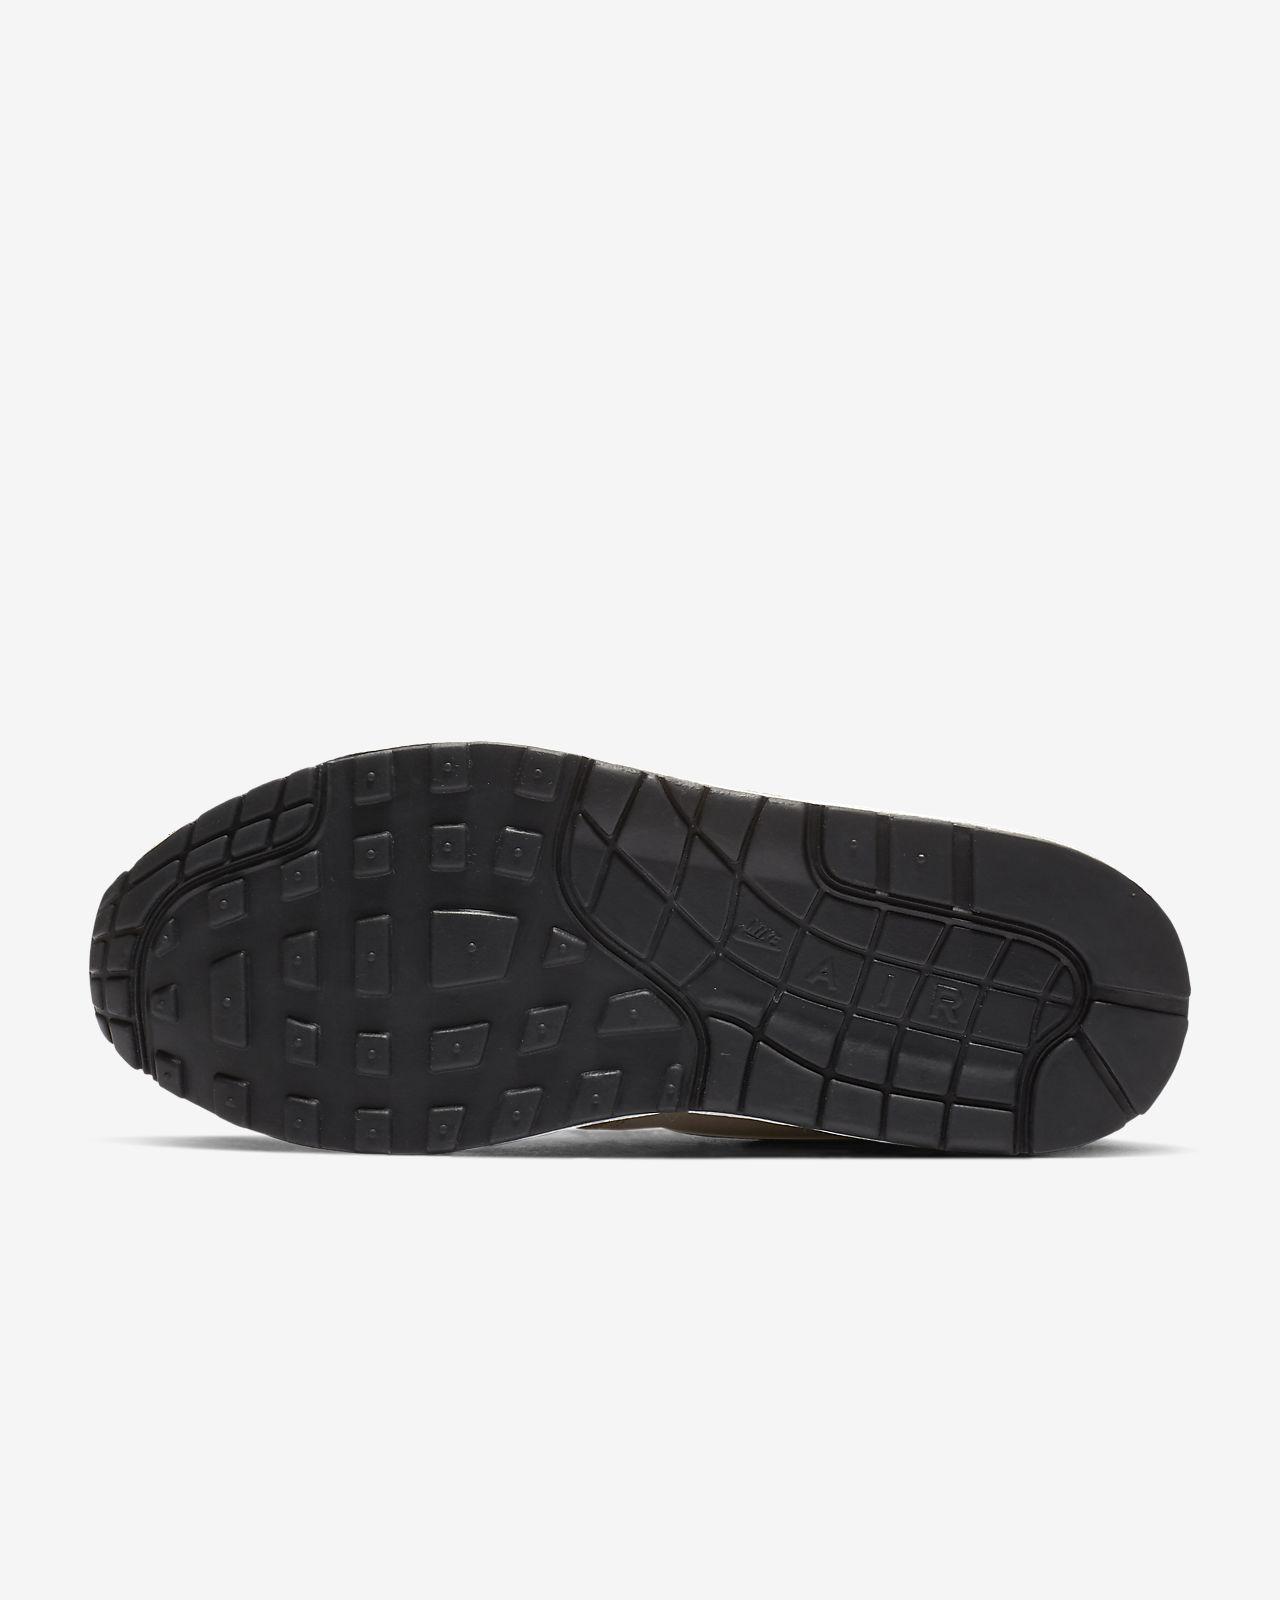 0d032e2e51 Nike Air Max 1 Premium Women's Shoe. Nike.com GB